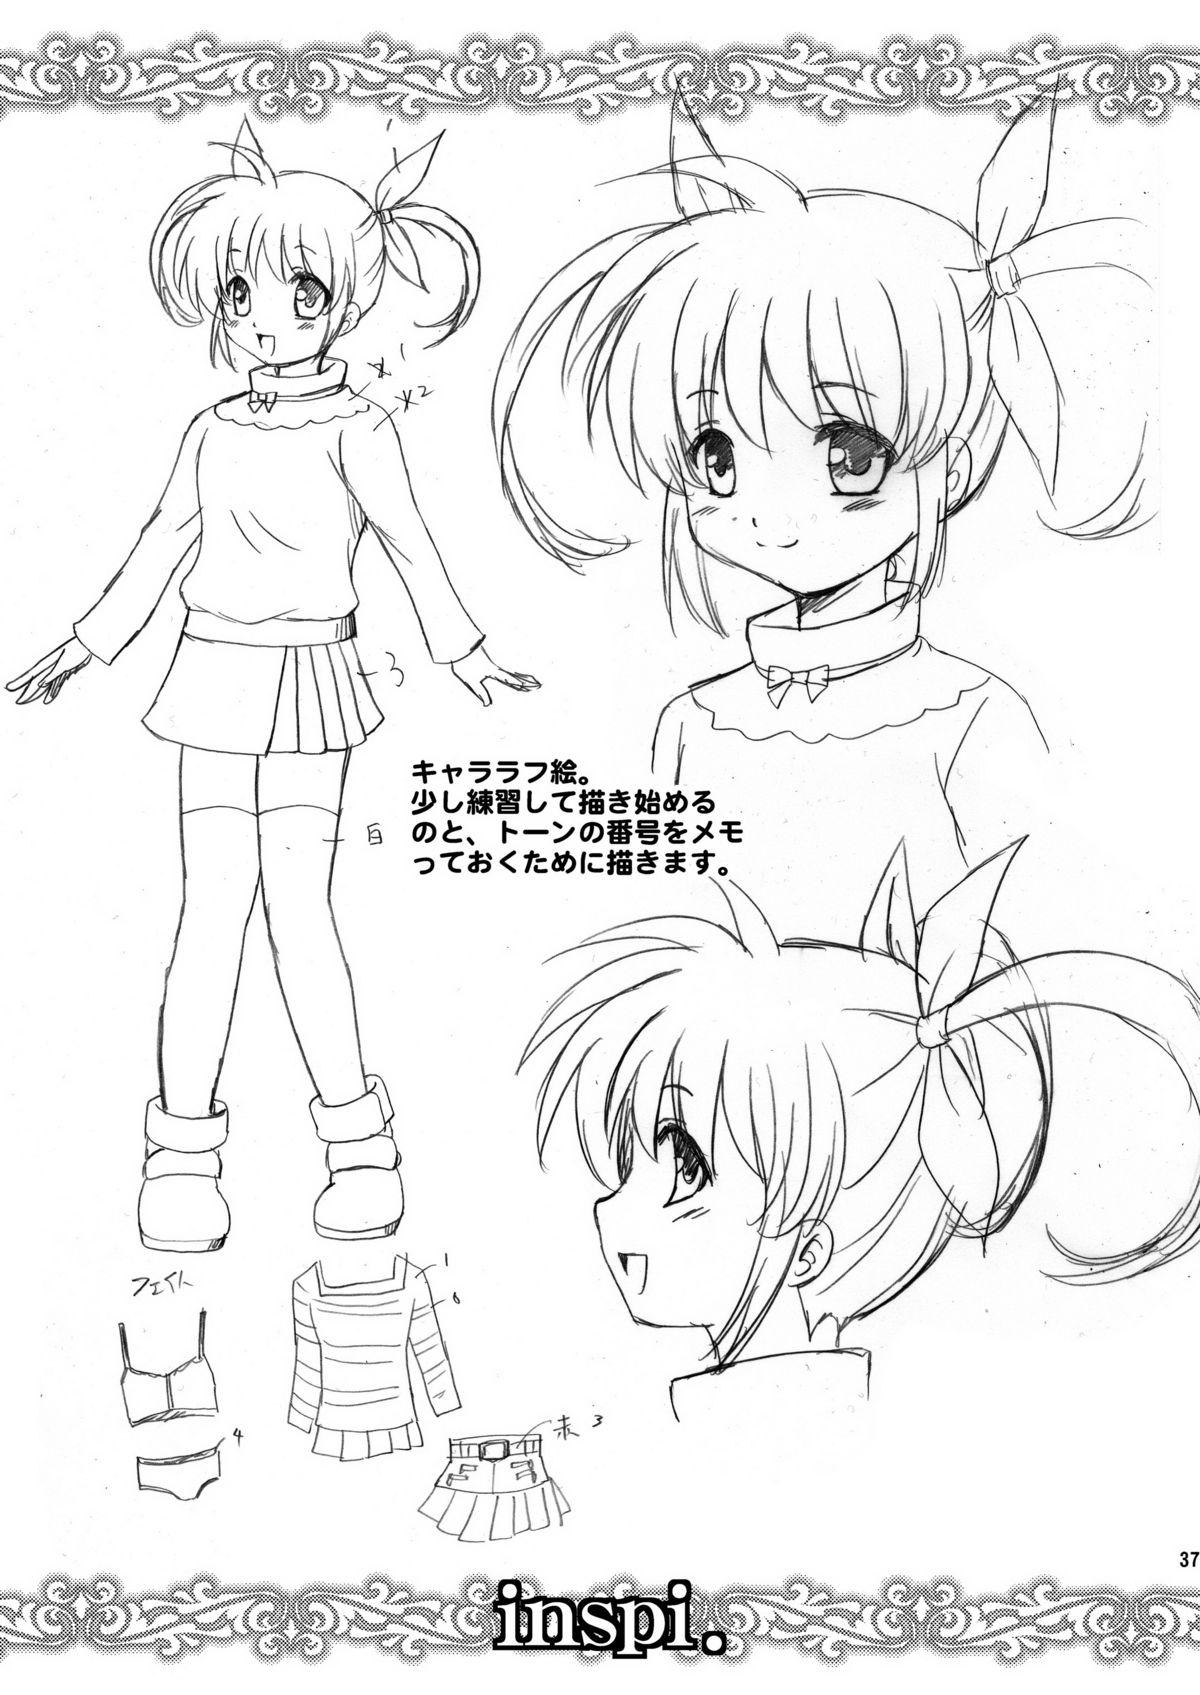 W Fate-san 36